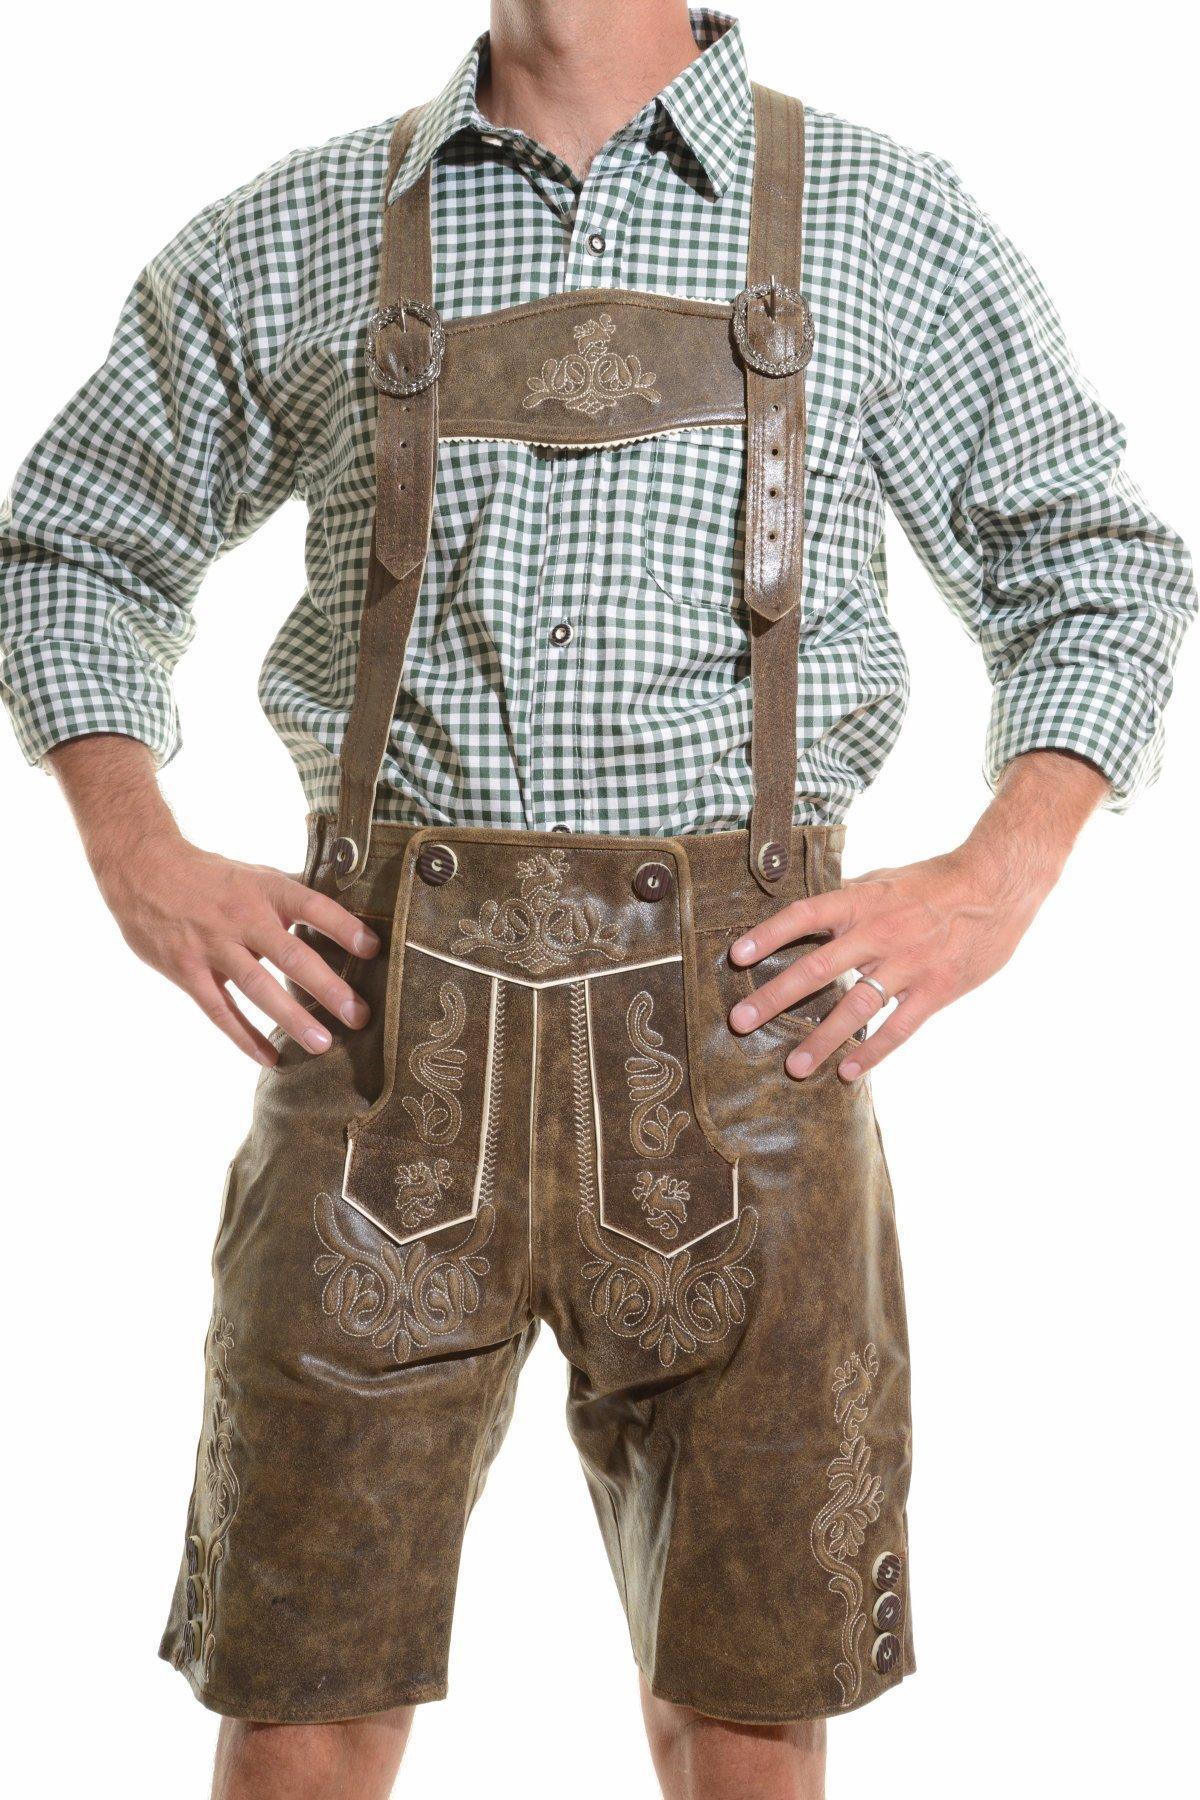 lederhosen4u Men's Bavarian Lederhosen Rustic CRACKER - Oktoberfest Leather Trousers, Antique Rustic Brown, 42